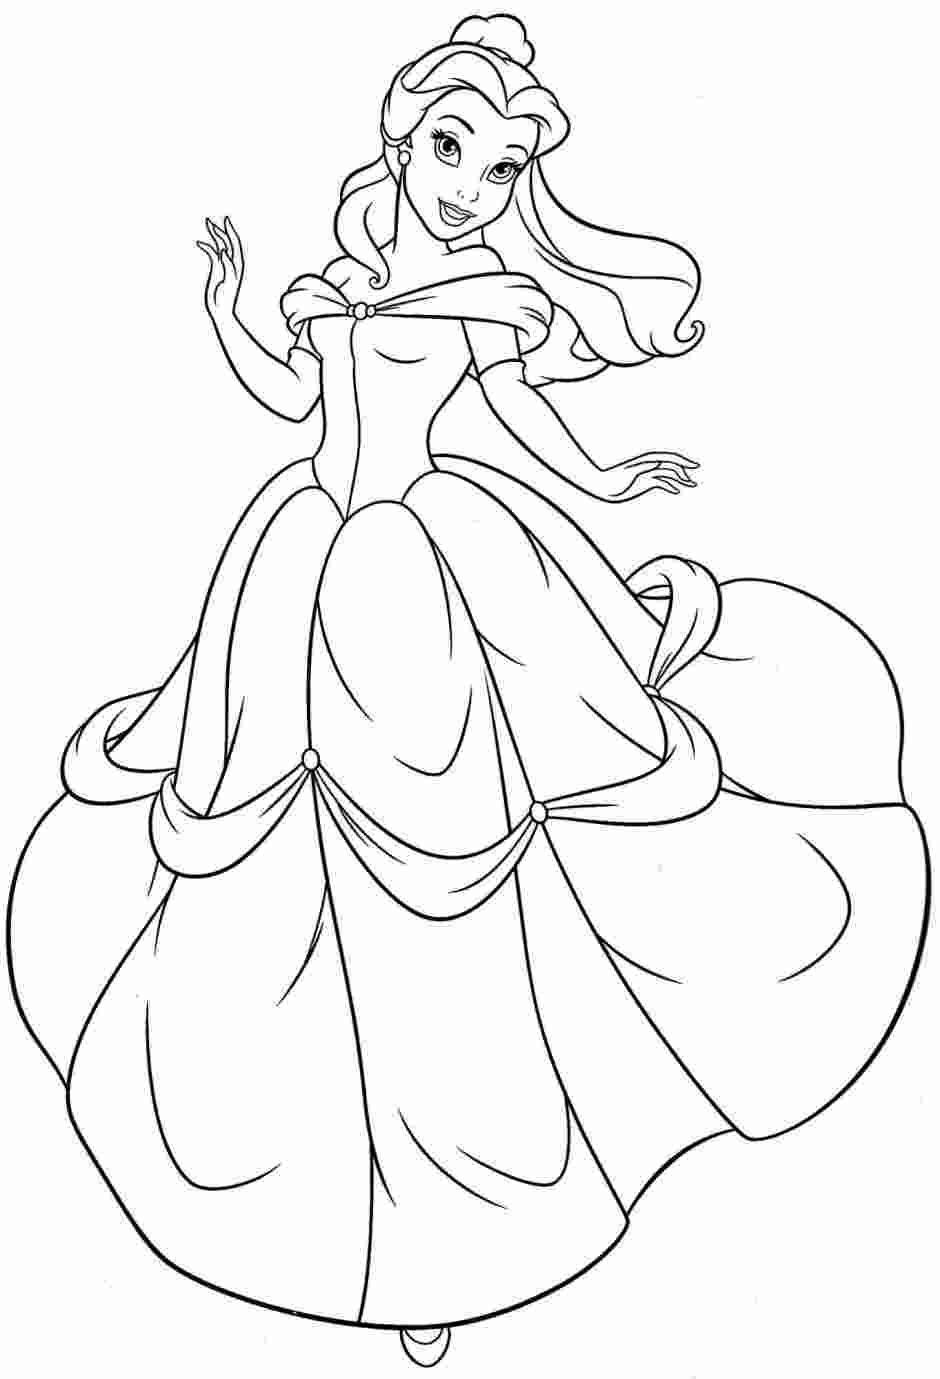 Free Disney Belle Coloring Pages Disney Princess Coloring Pages Tinkerbell Coloring Pages Disney Princess Colors